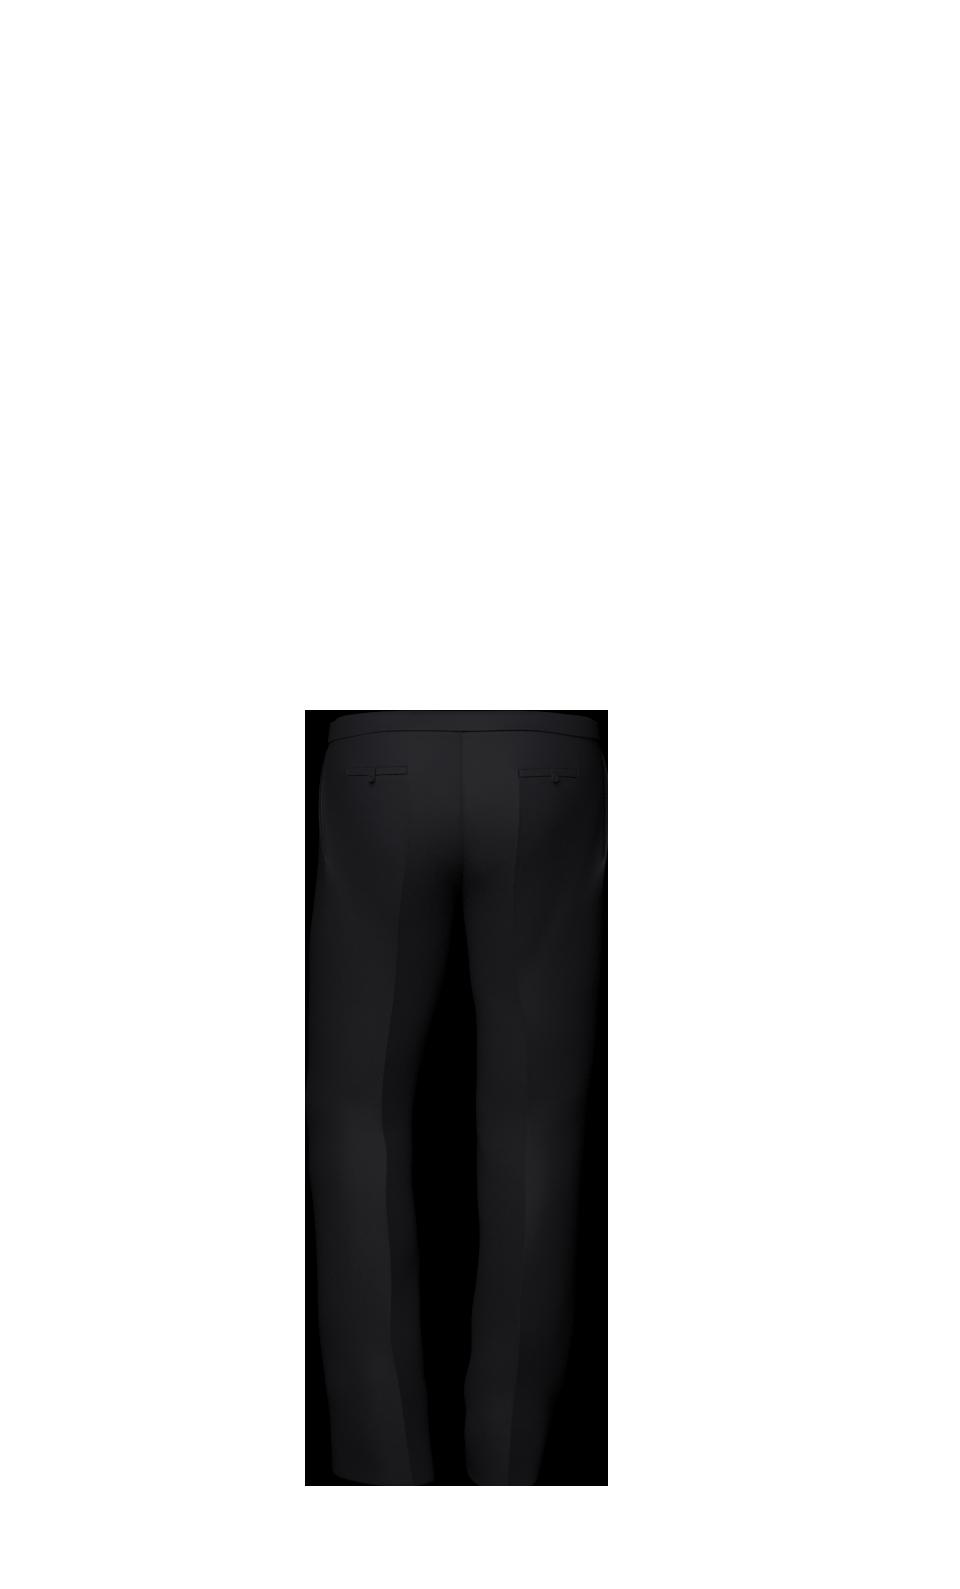 Kids clipart pants. Design your own tuxedo